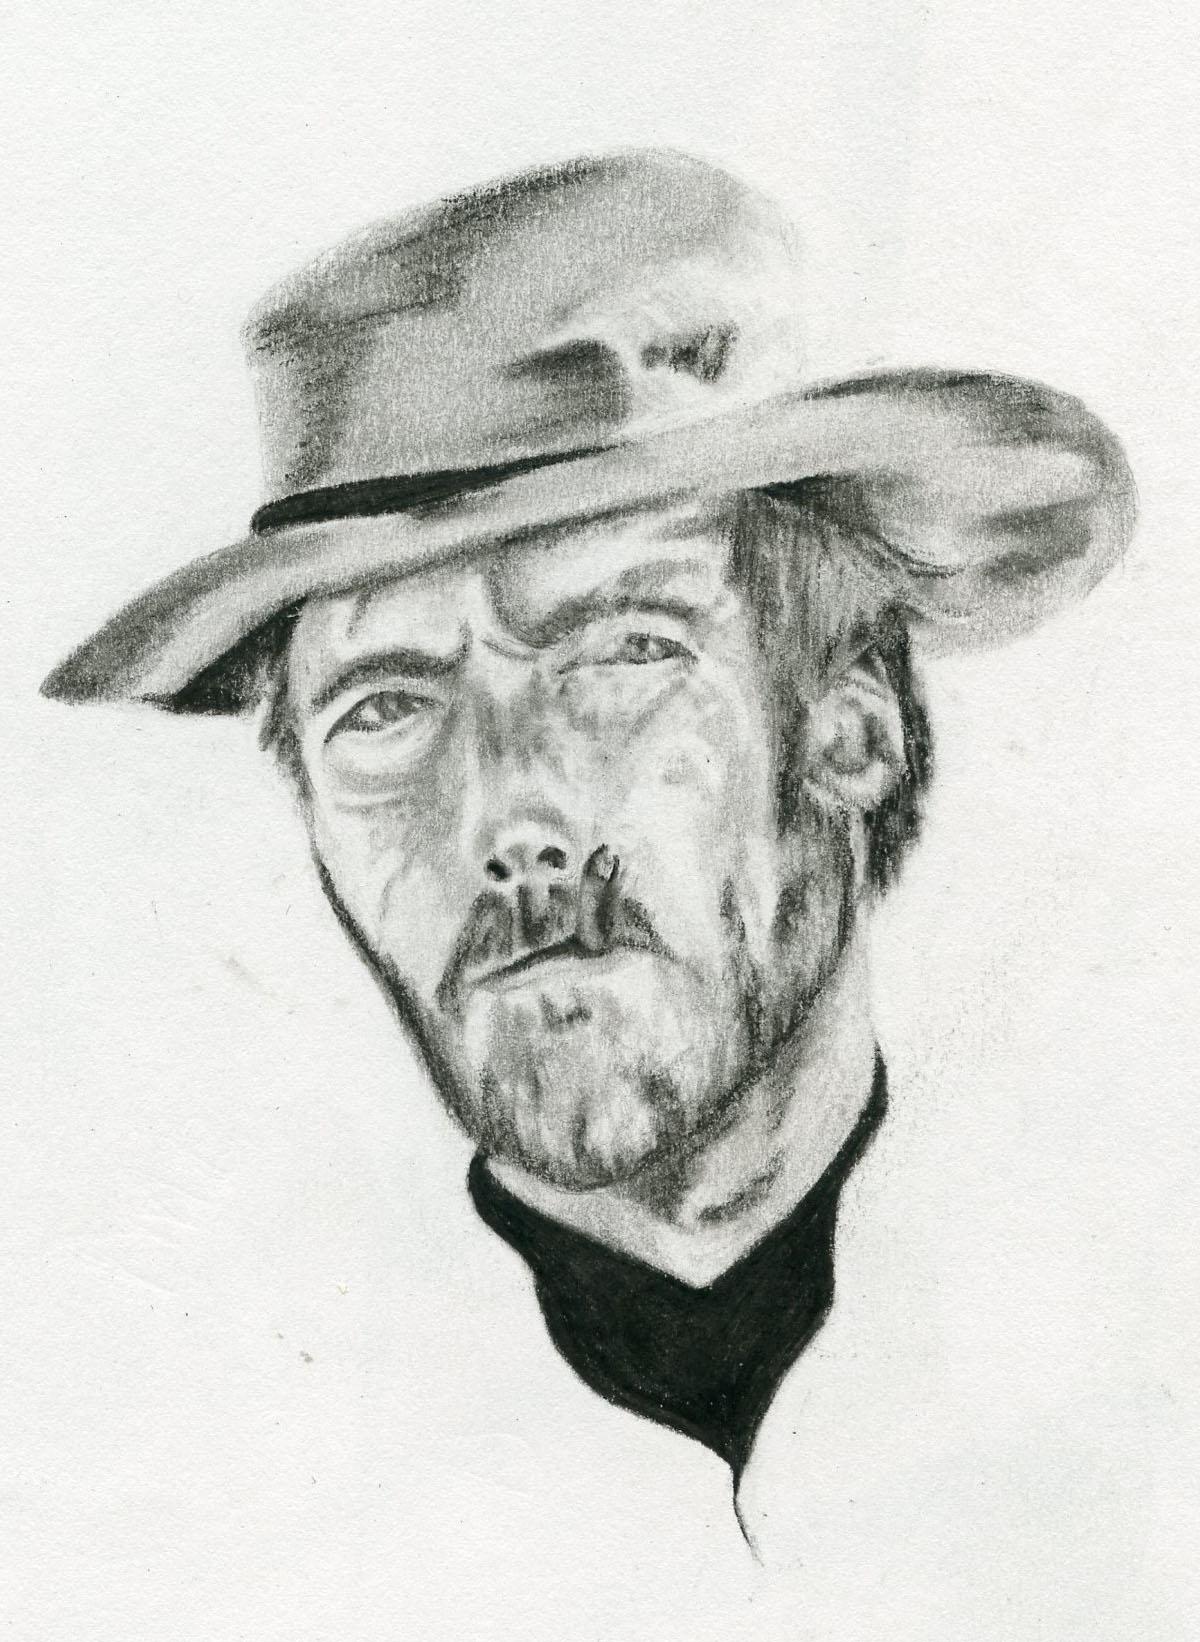 Eastwood Cowboy